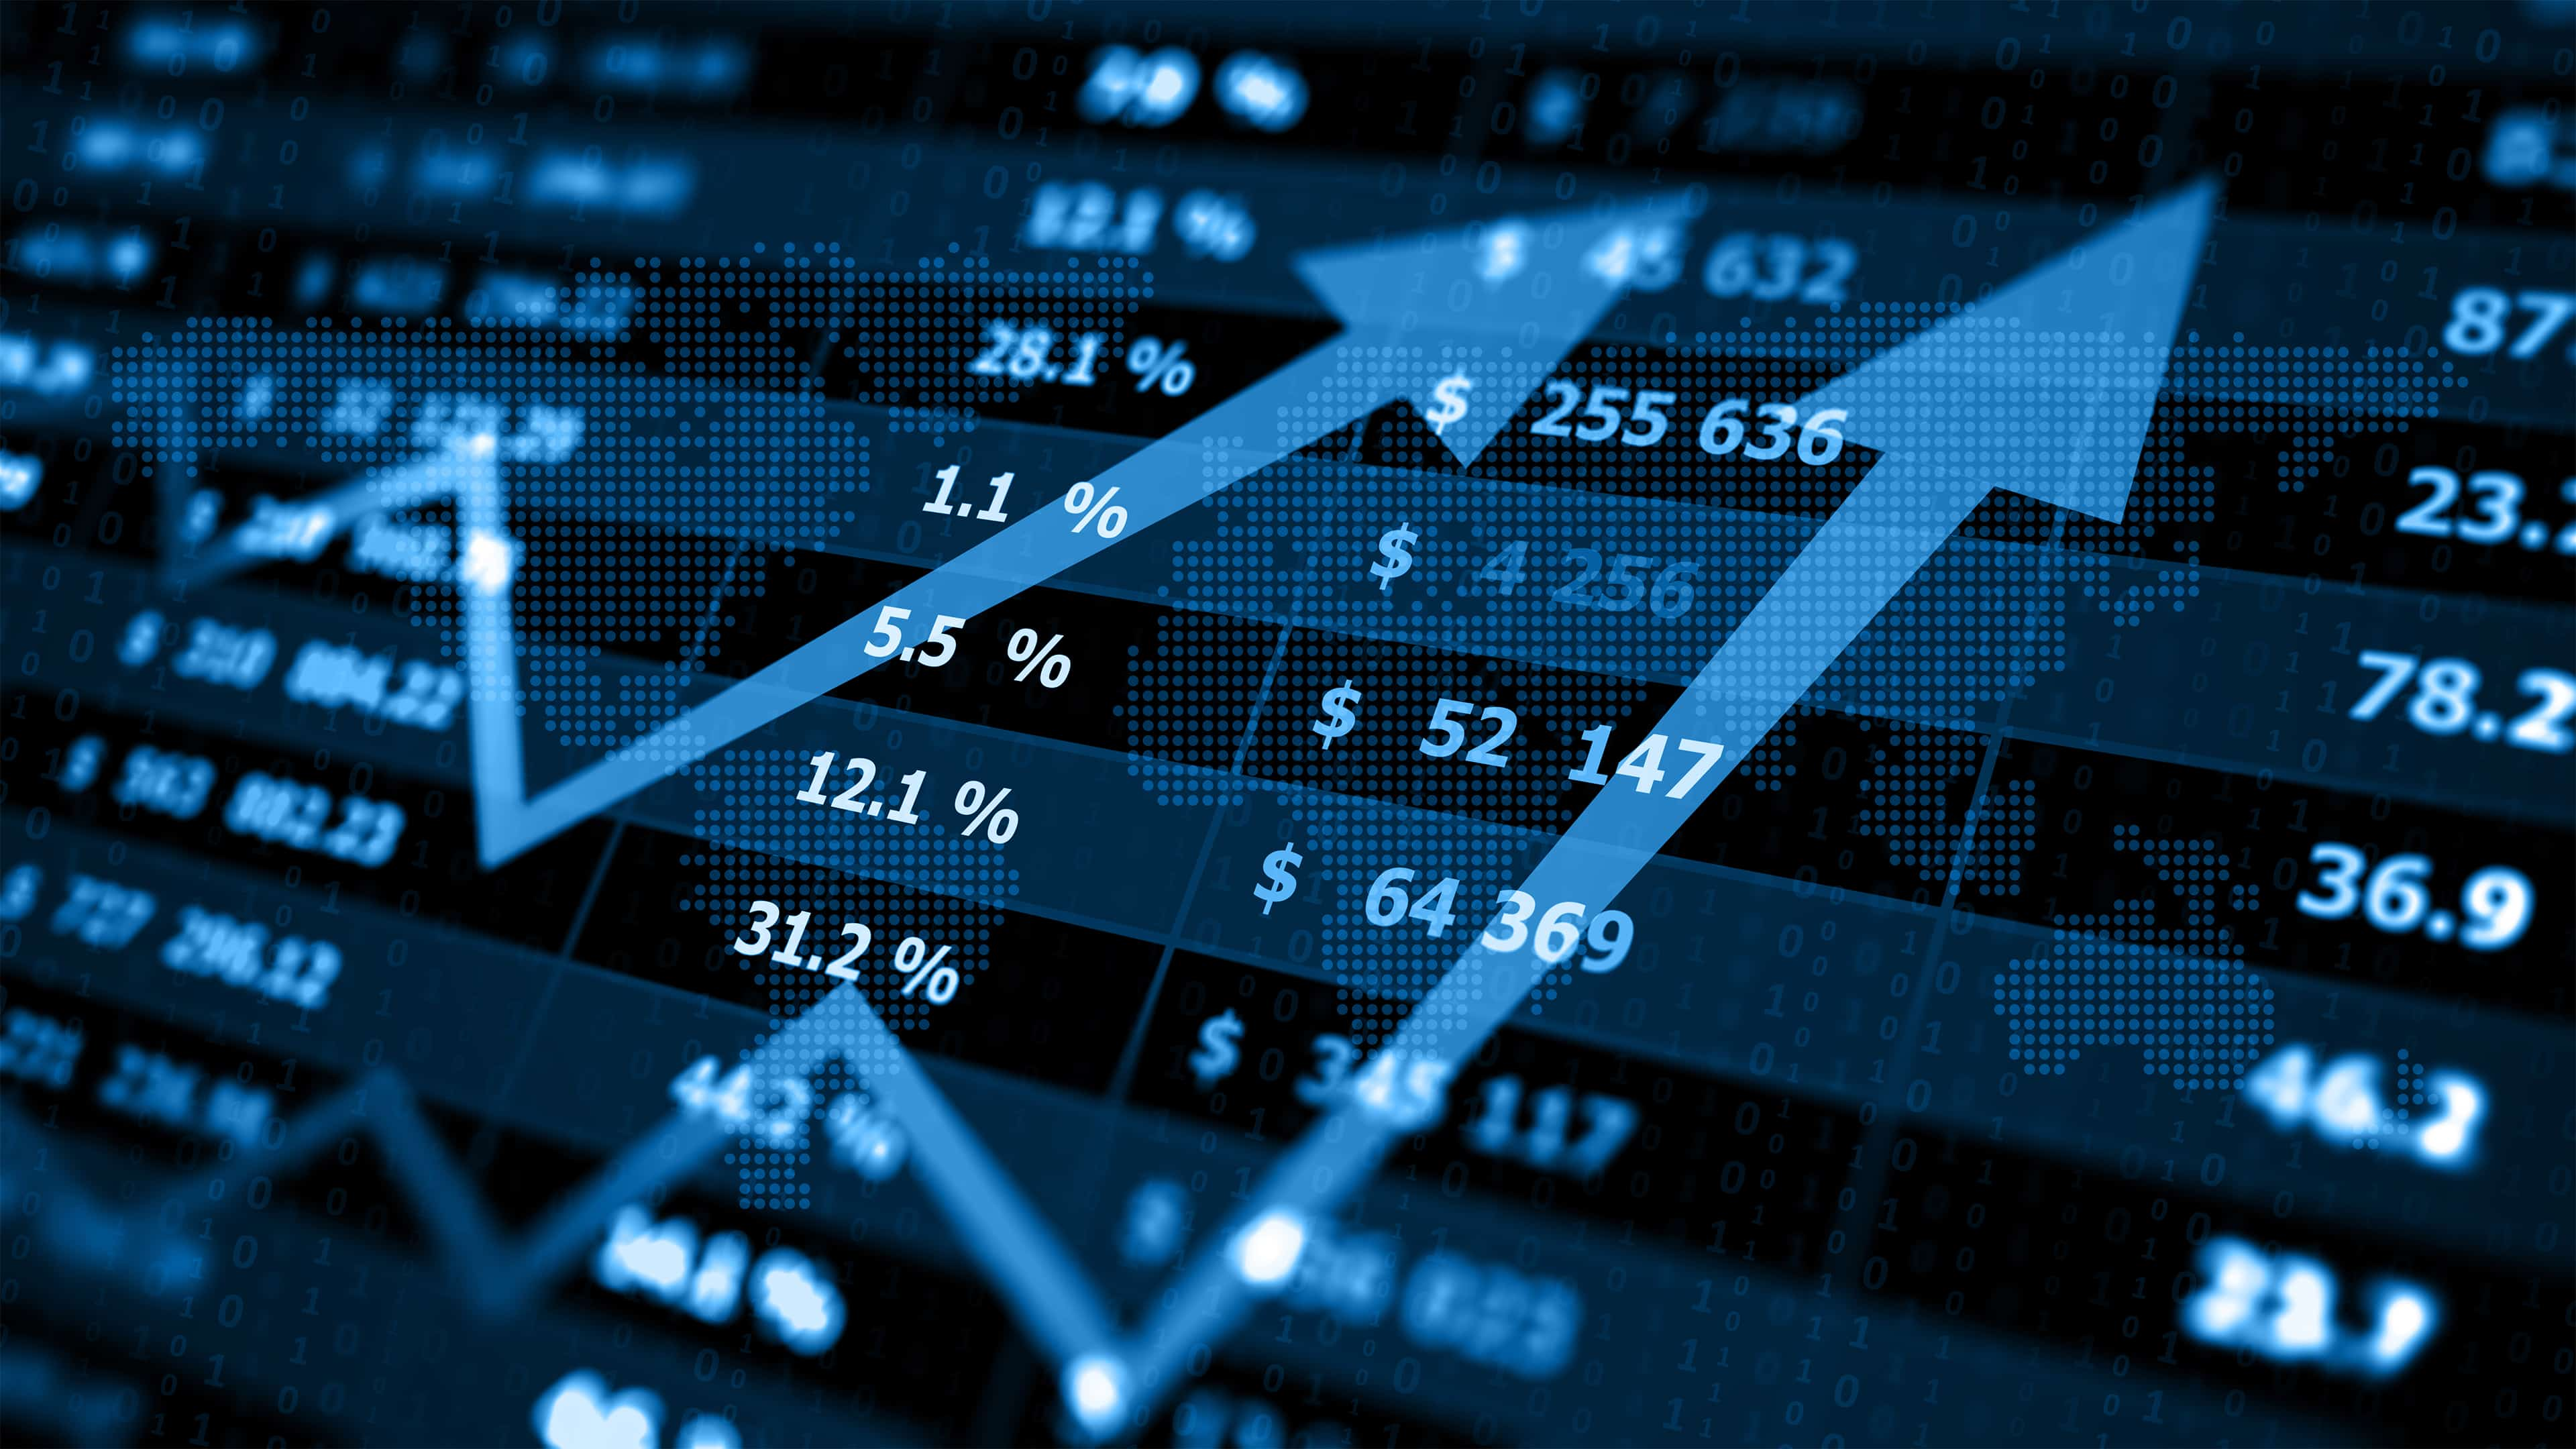 Stock Market Electronic Chart Bullish UHD 4K Wallpaper Pixelz 3840x2160